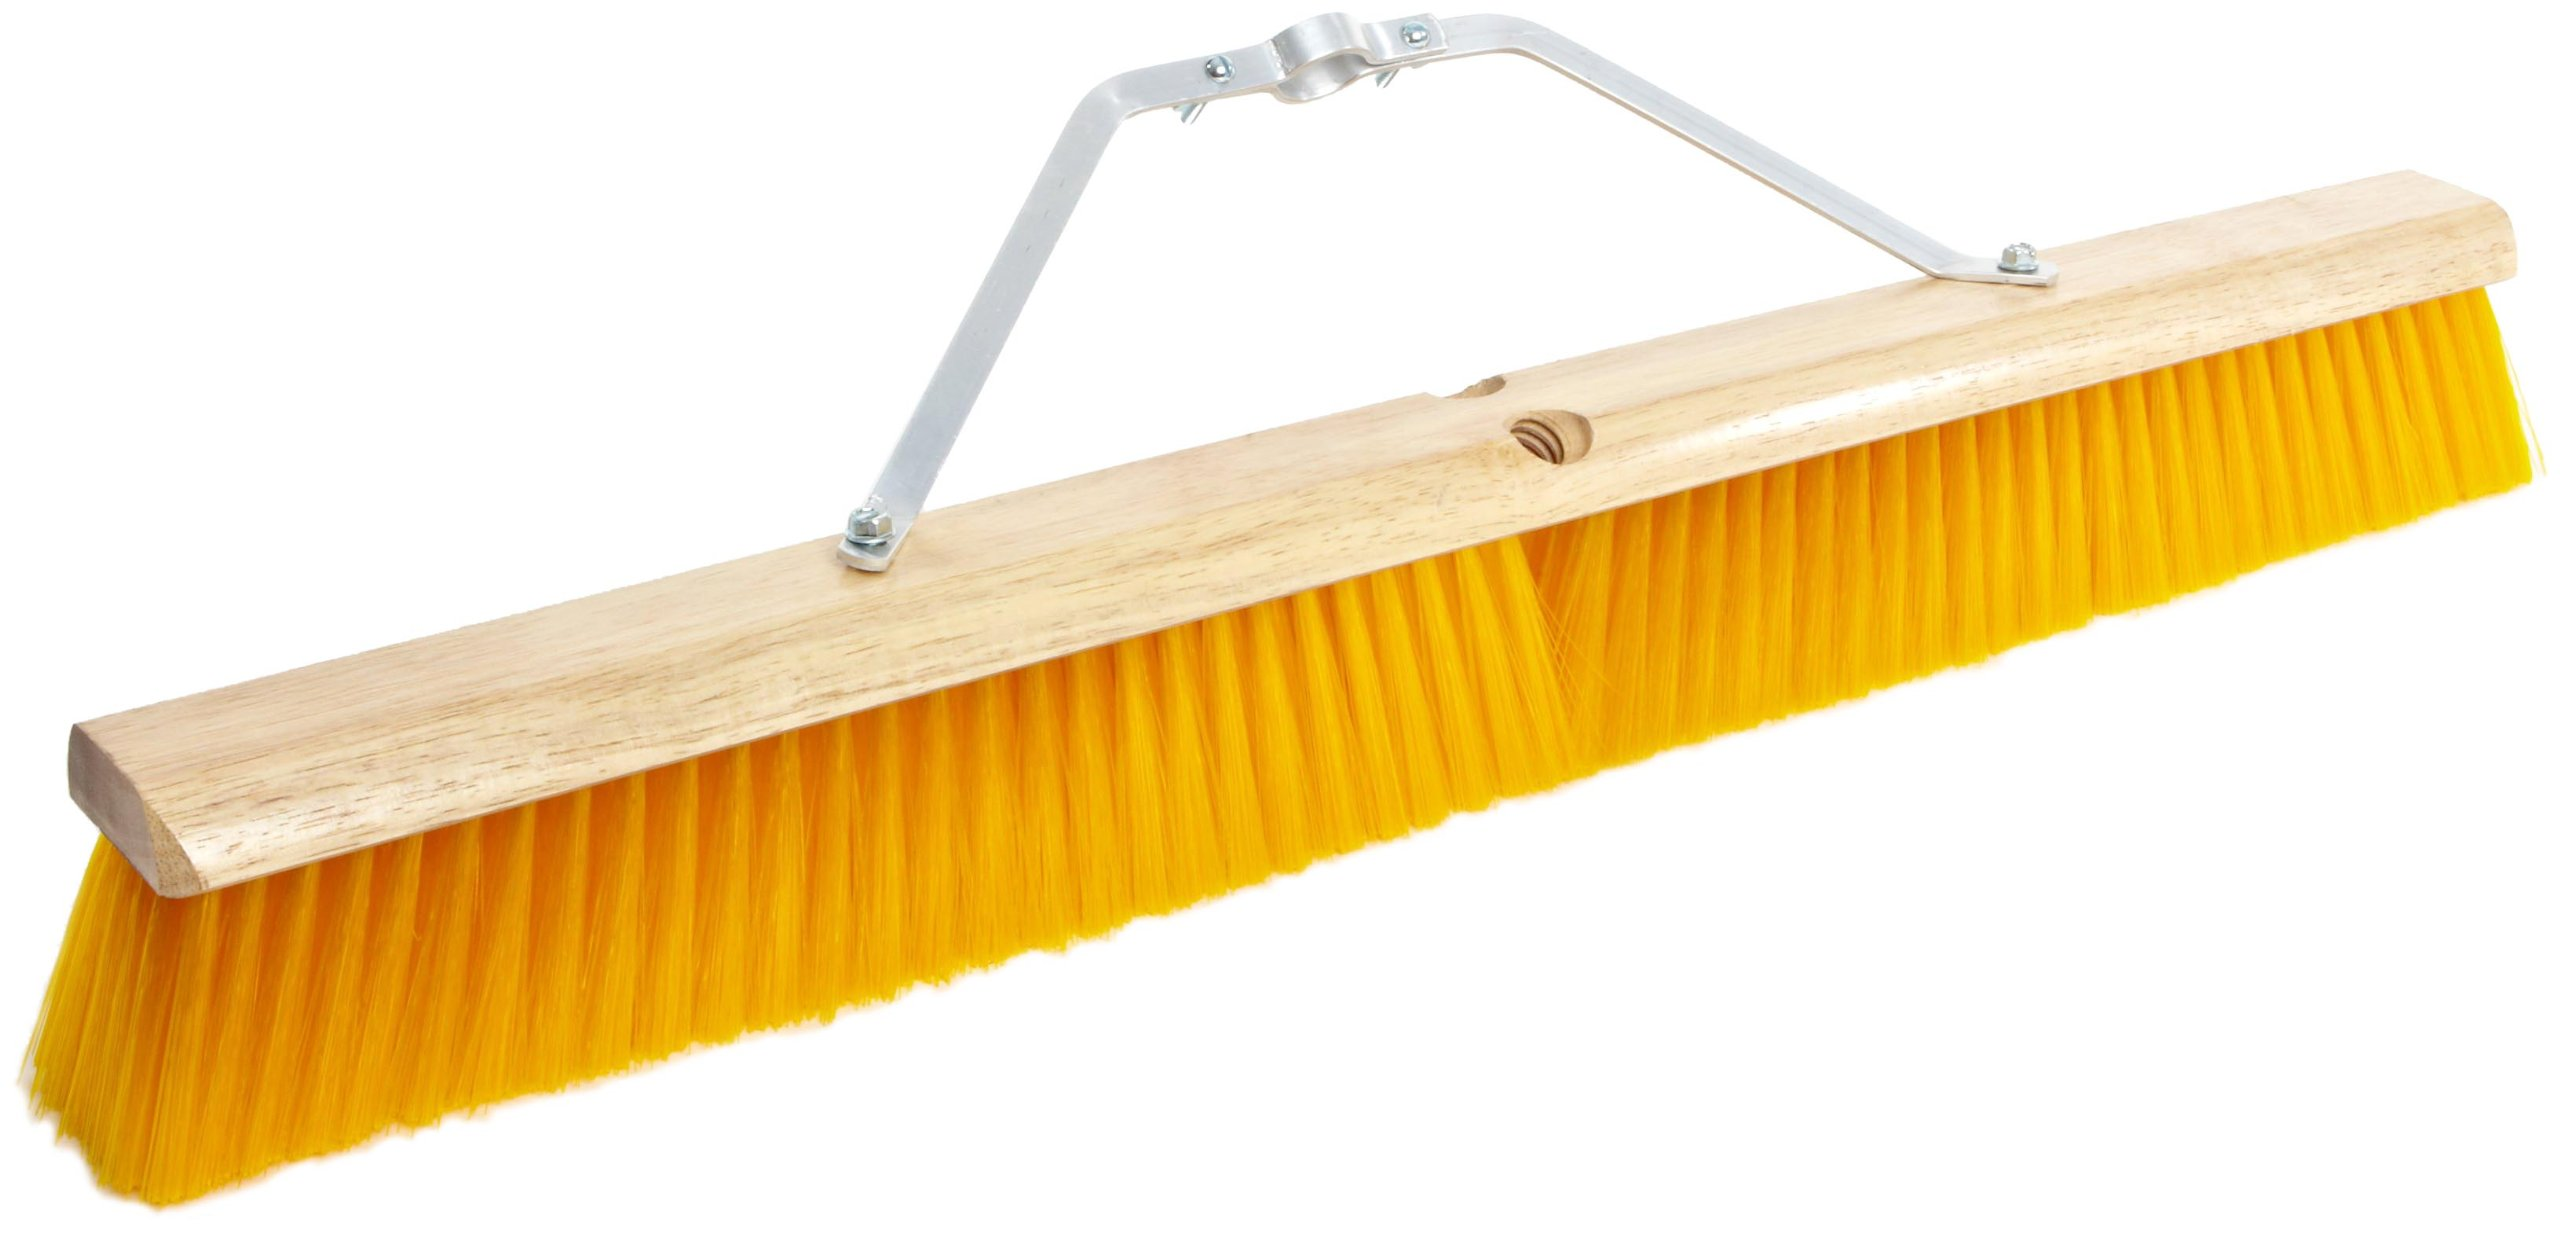 No. 19 Line Floor Brushes - 30'' floor brush w/m60 2d04b1d yellow plas